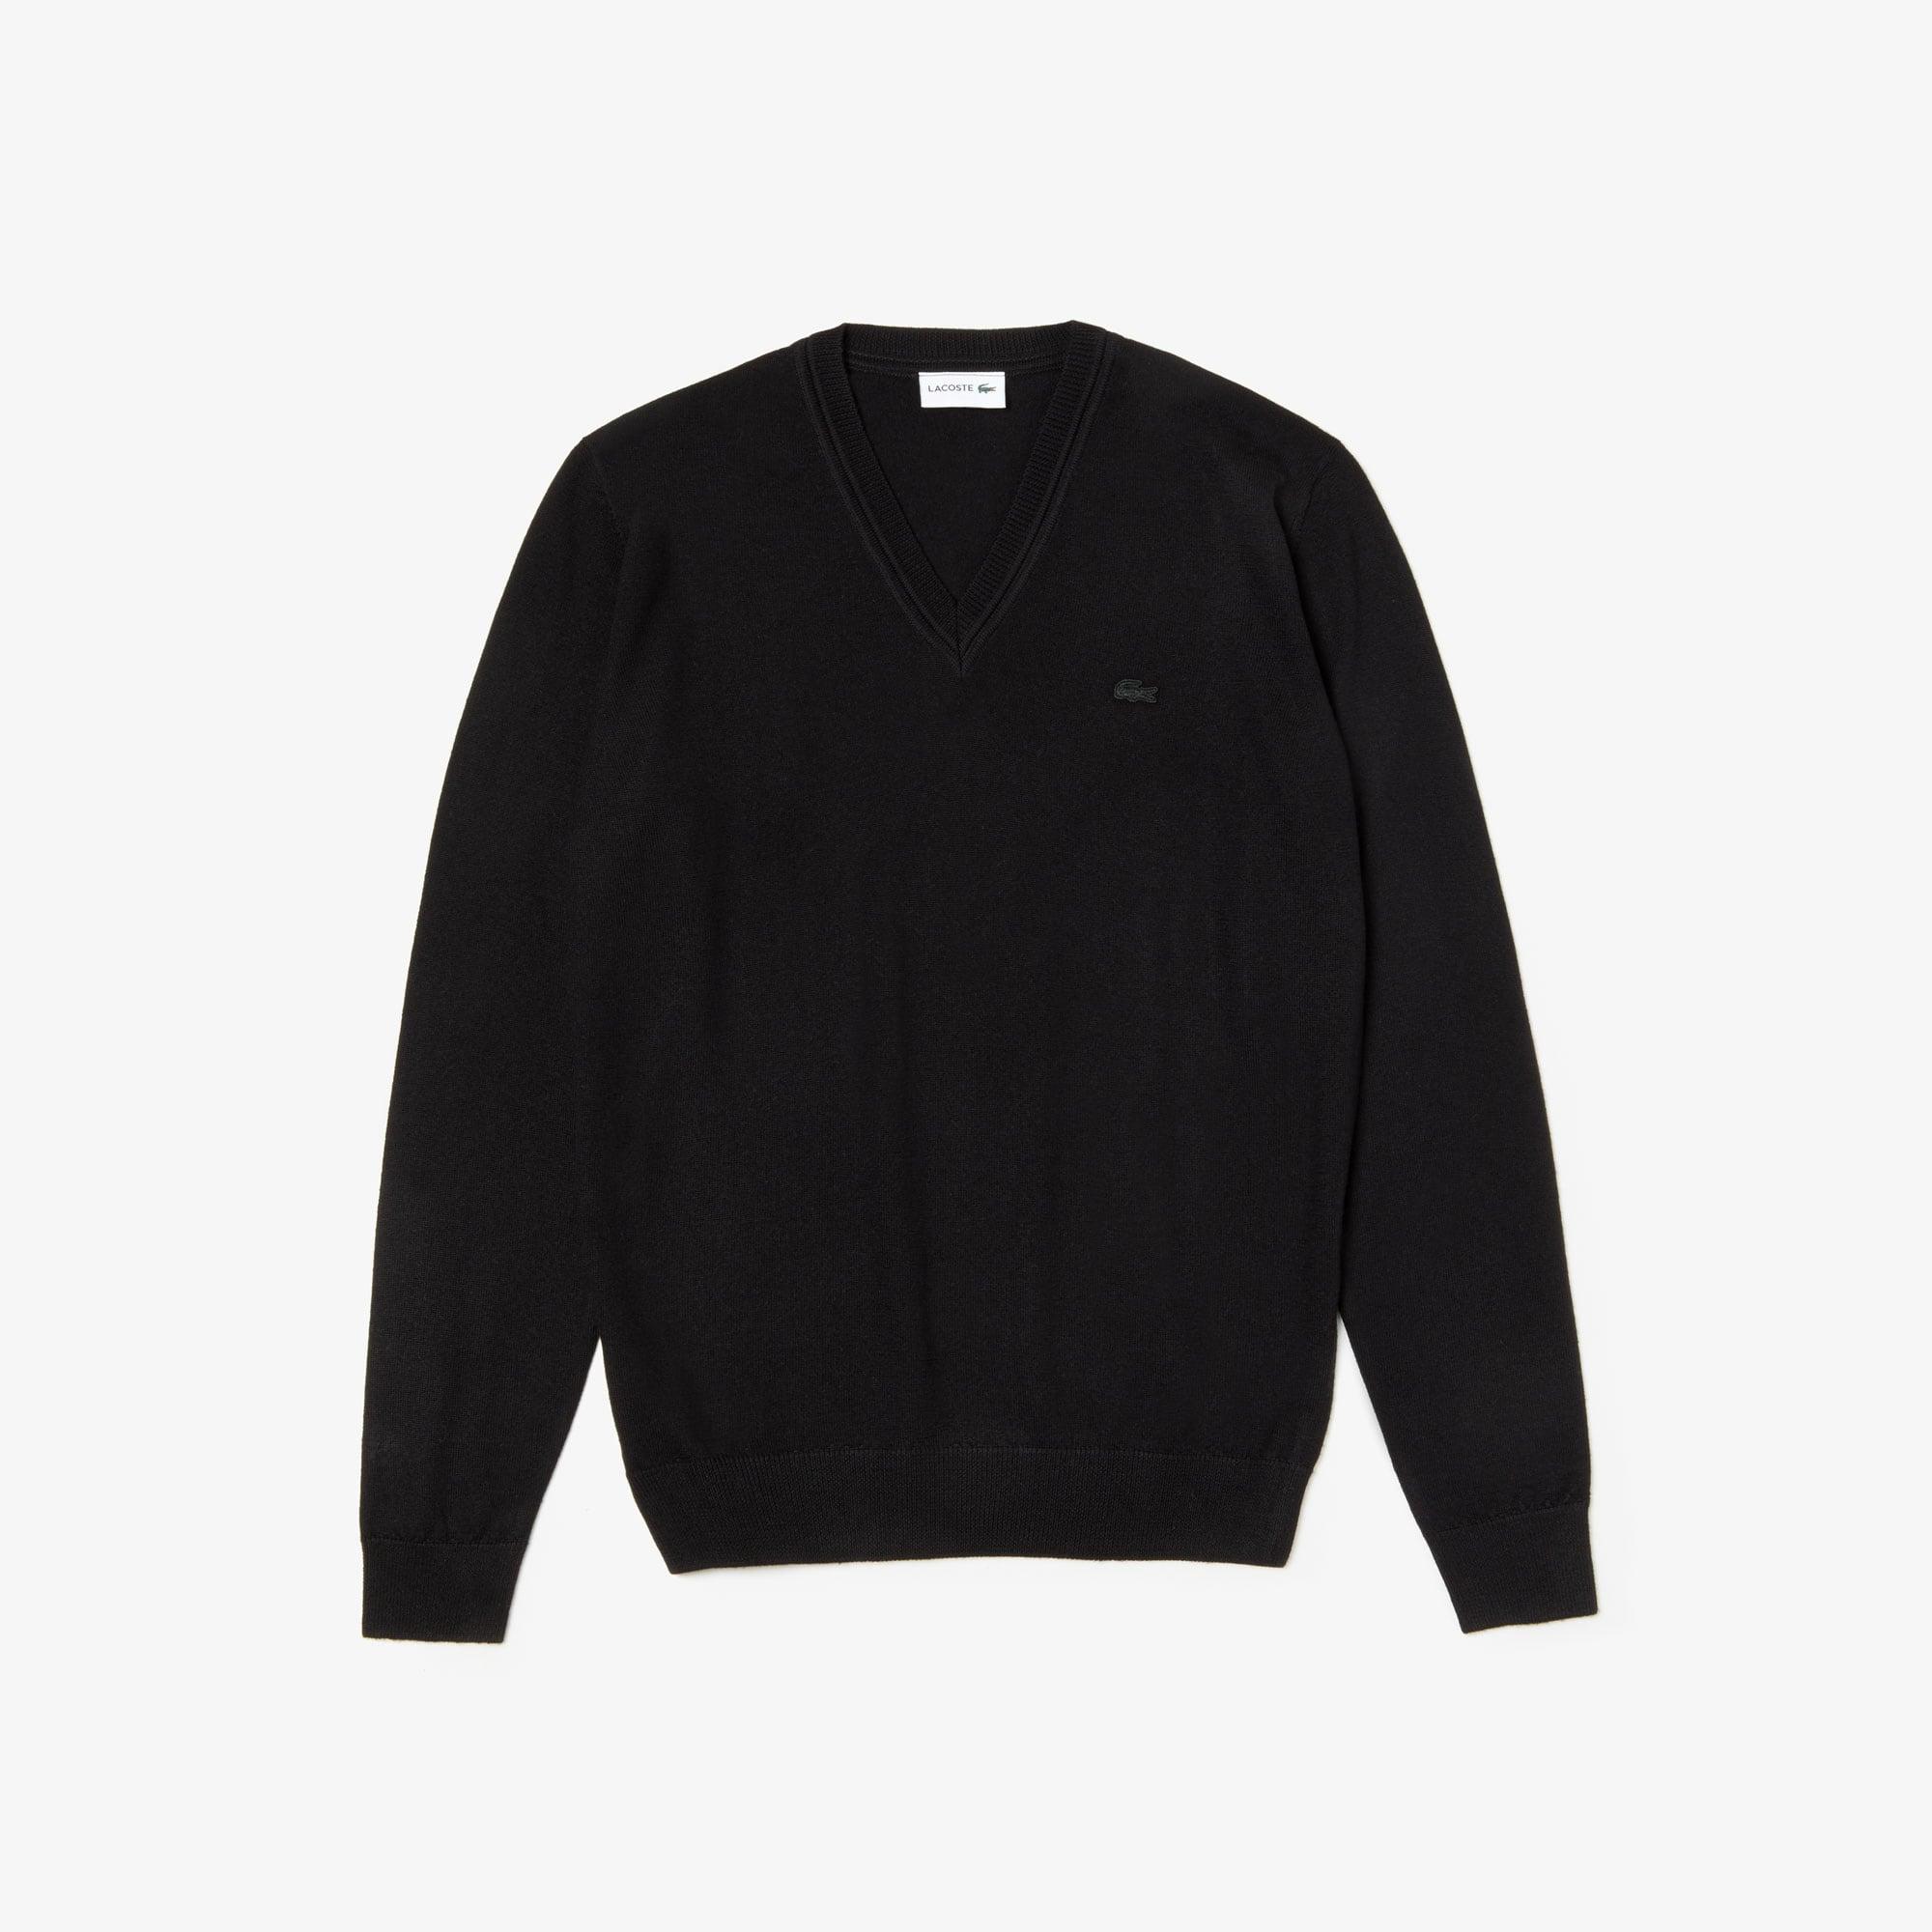 cbcca26dc1c17 Men s Sweaters